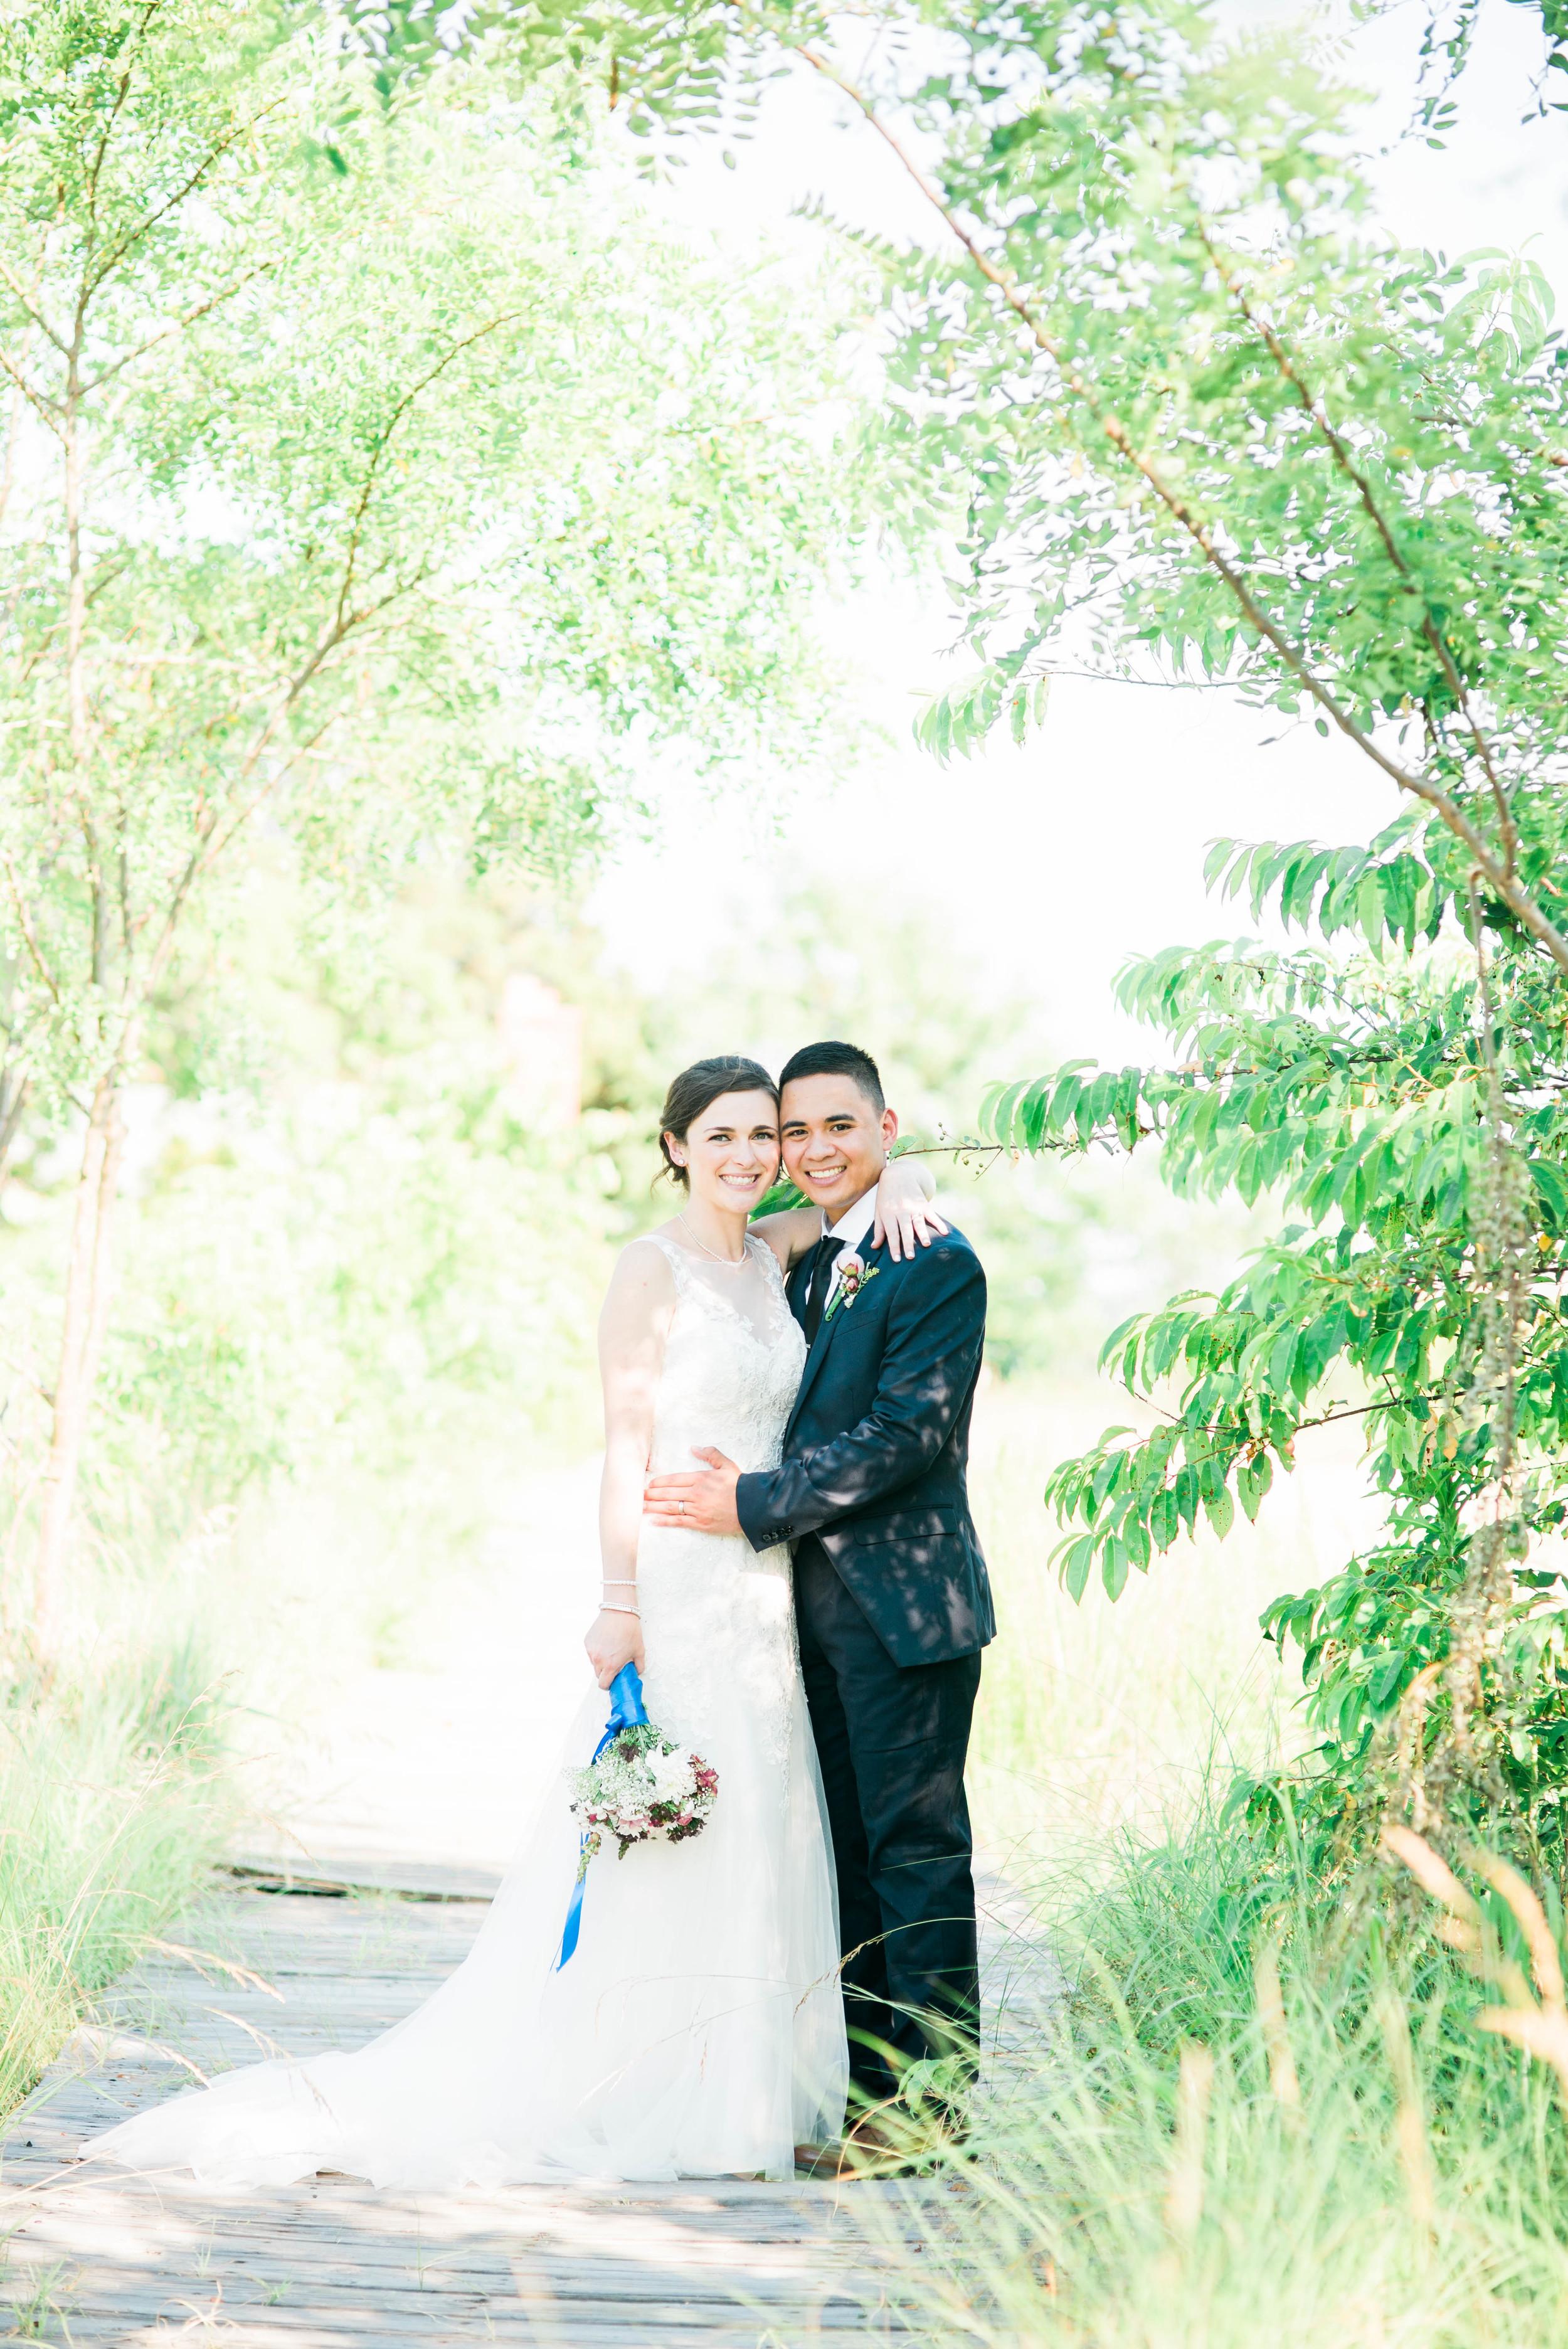 PREVIEWremowedding2016-60.jpg